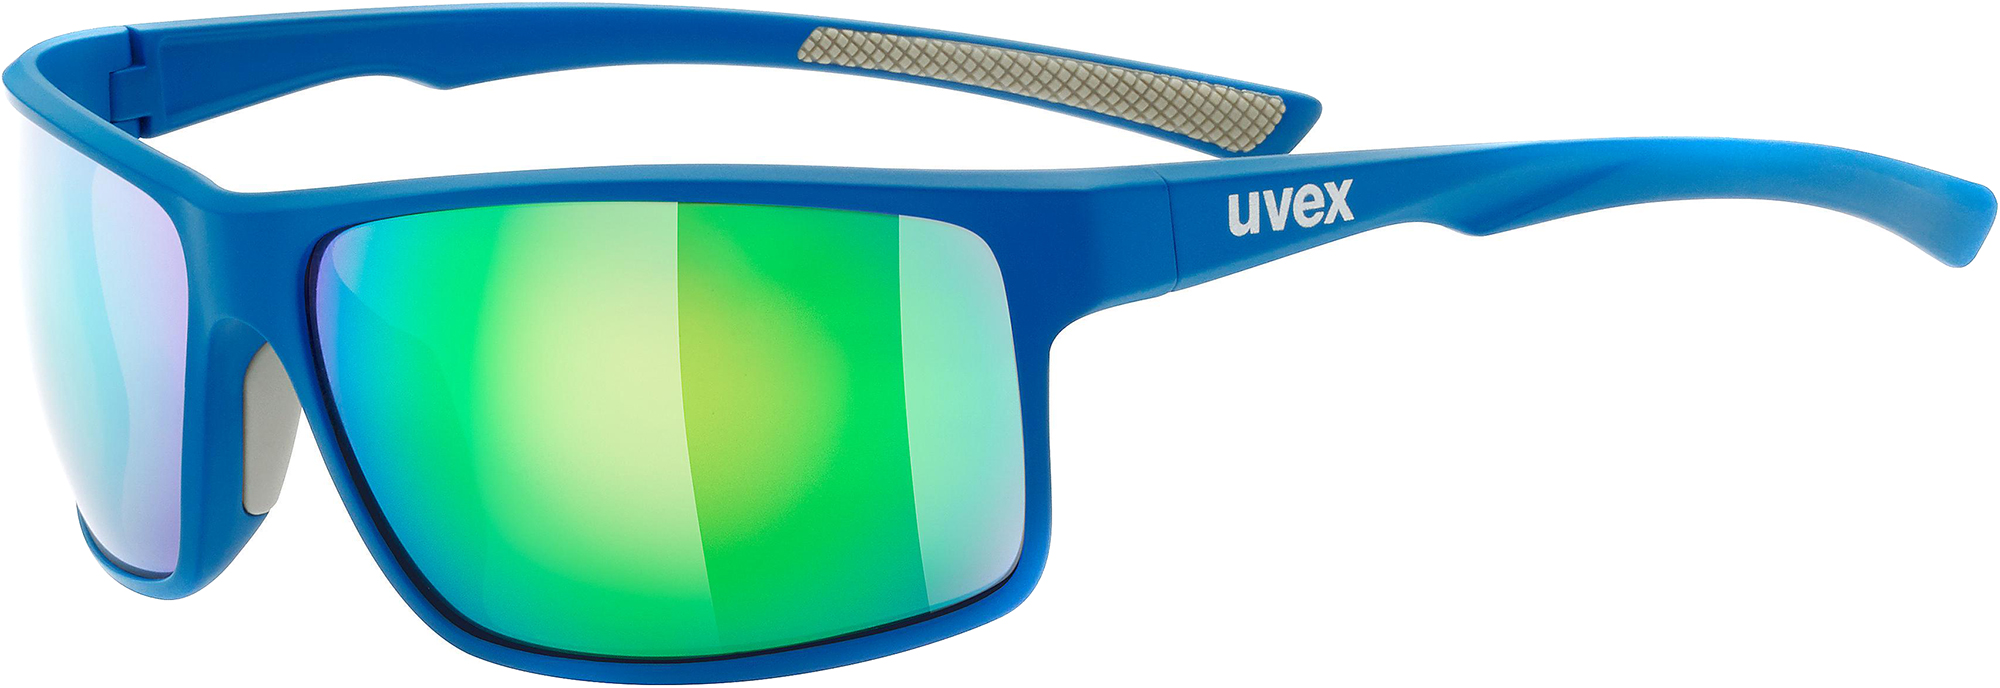 Uvex Солнцезащитные очки Uvex Lgl 44